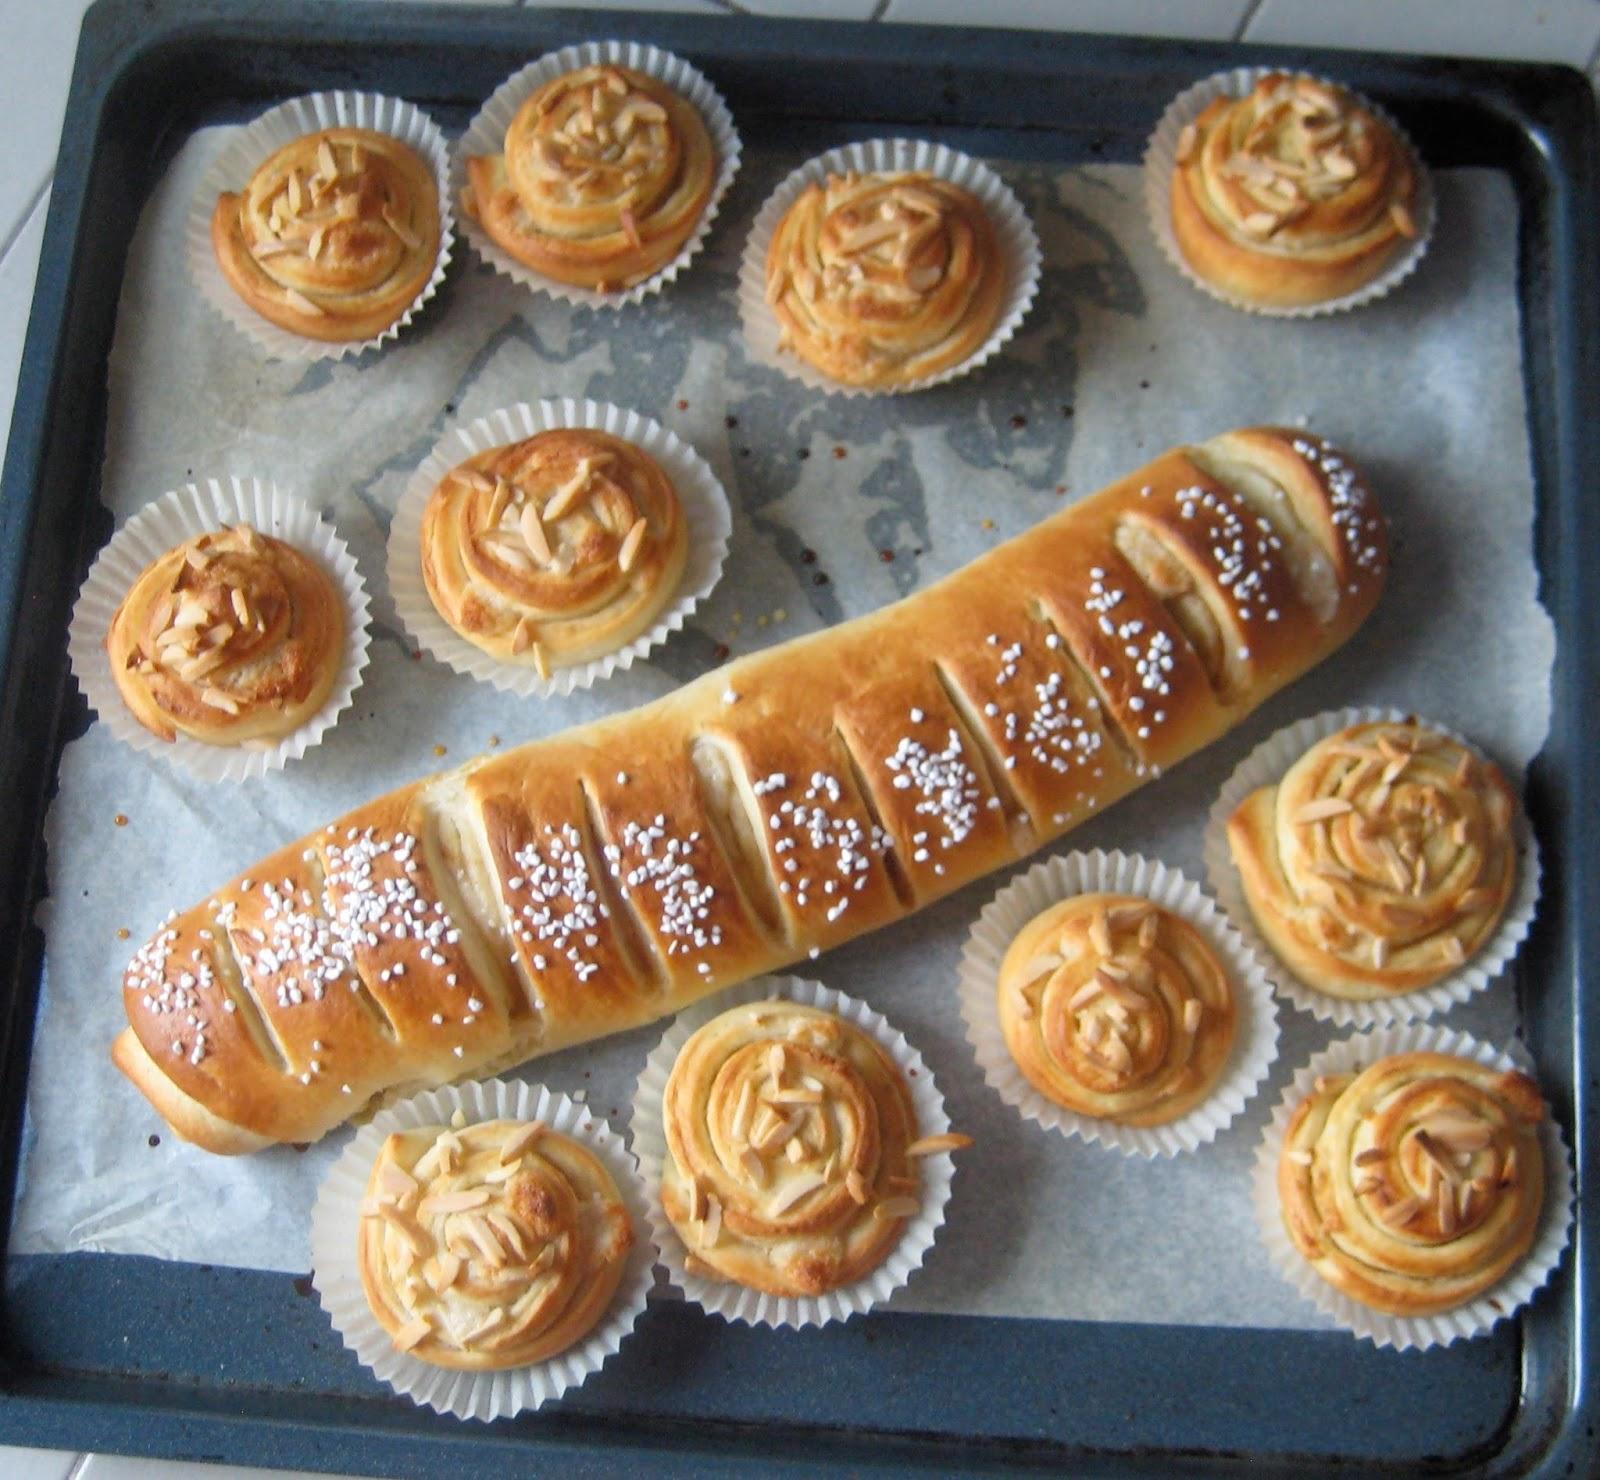 Kanelbullar and kanellängder (cinnamon buns and rolls)